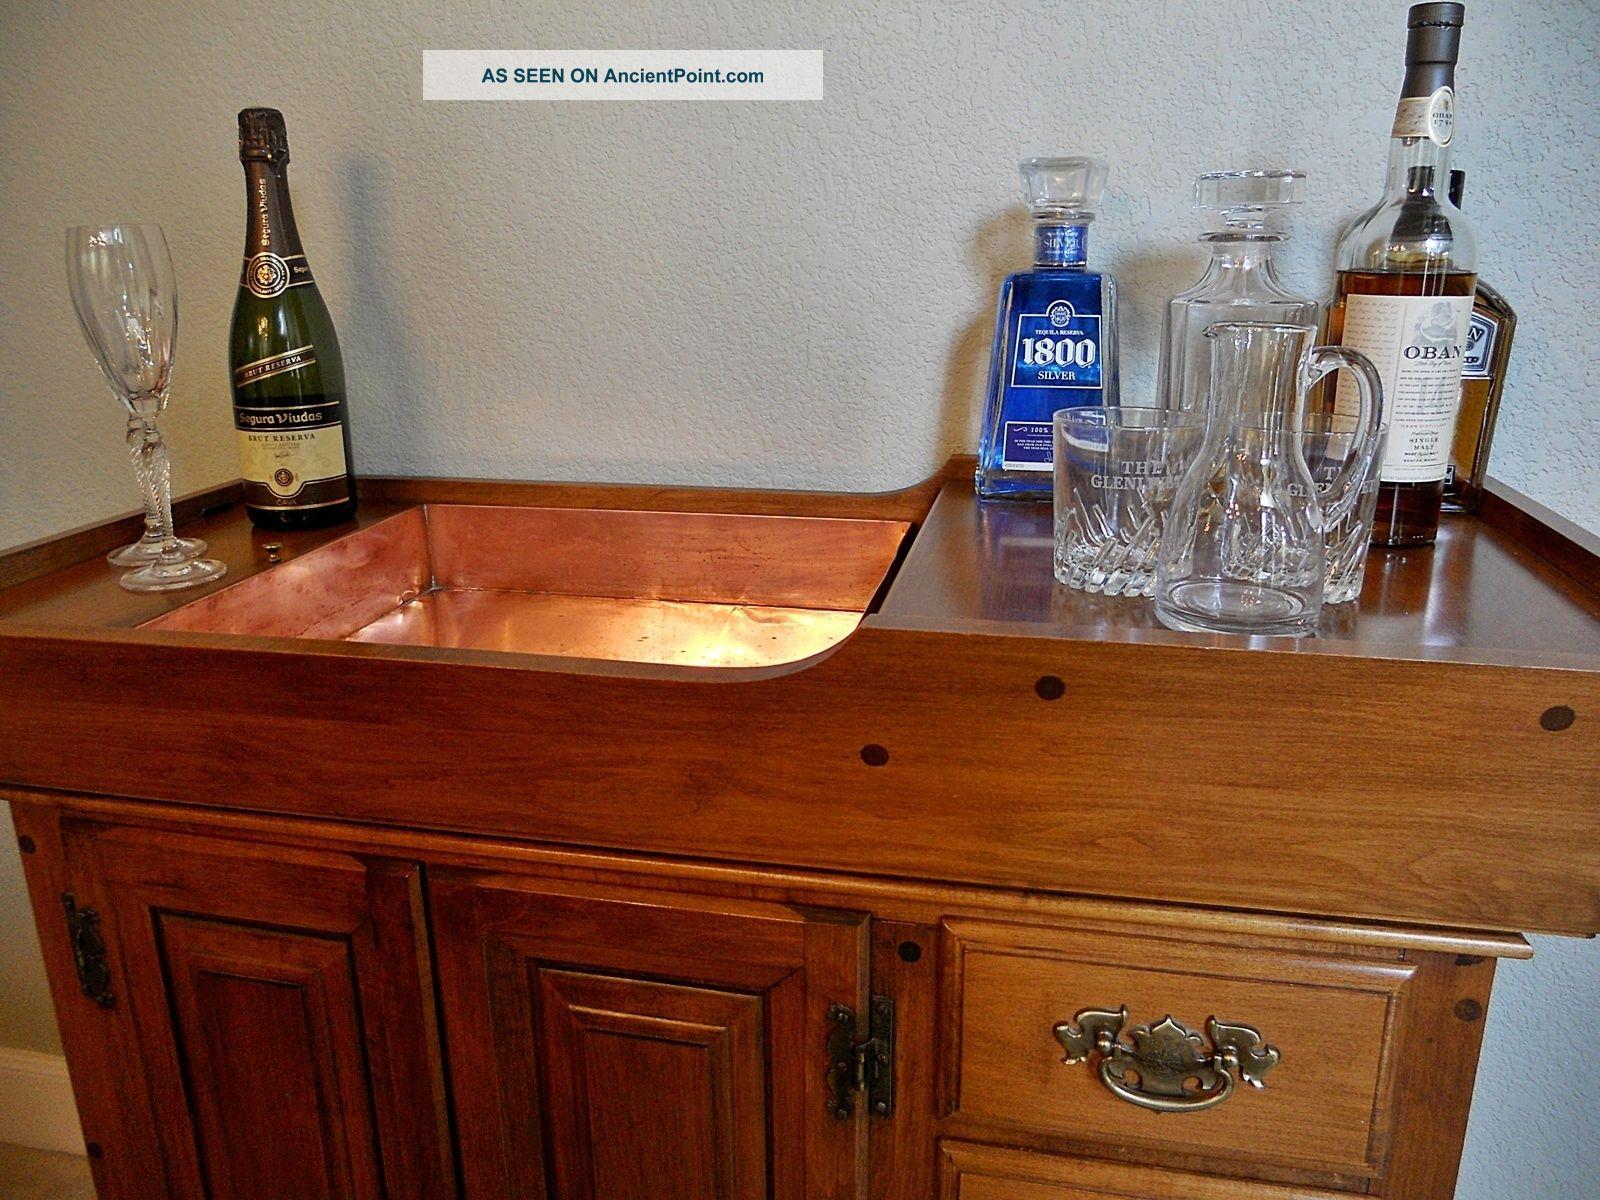 Pristine Condition Antique American Rock Maple Dry Sink Bar Sprague Carleton